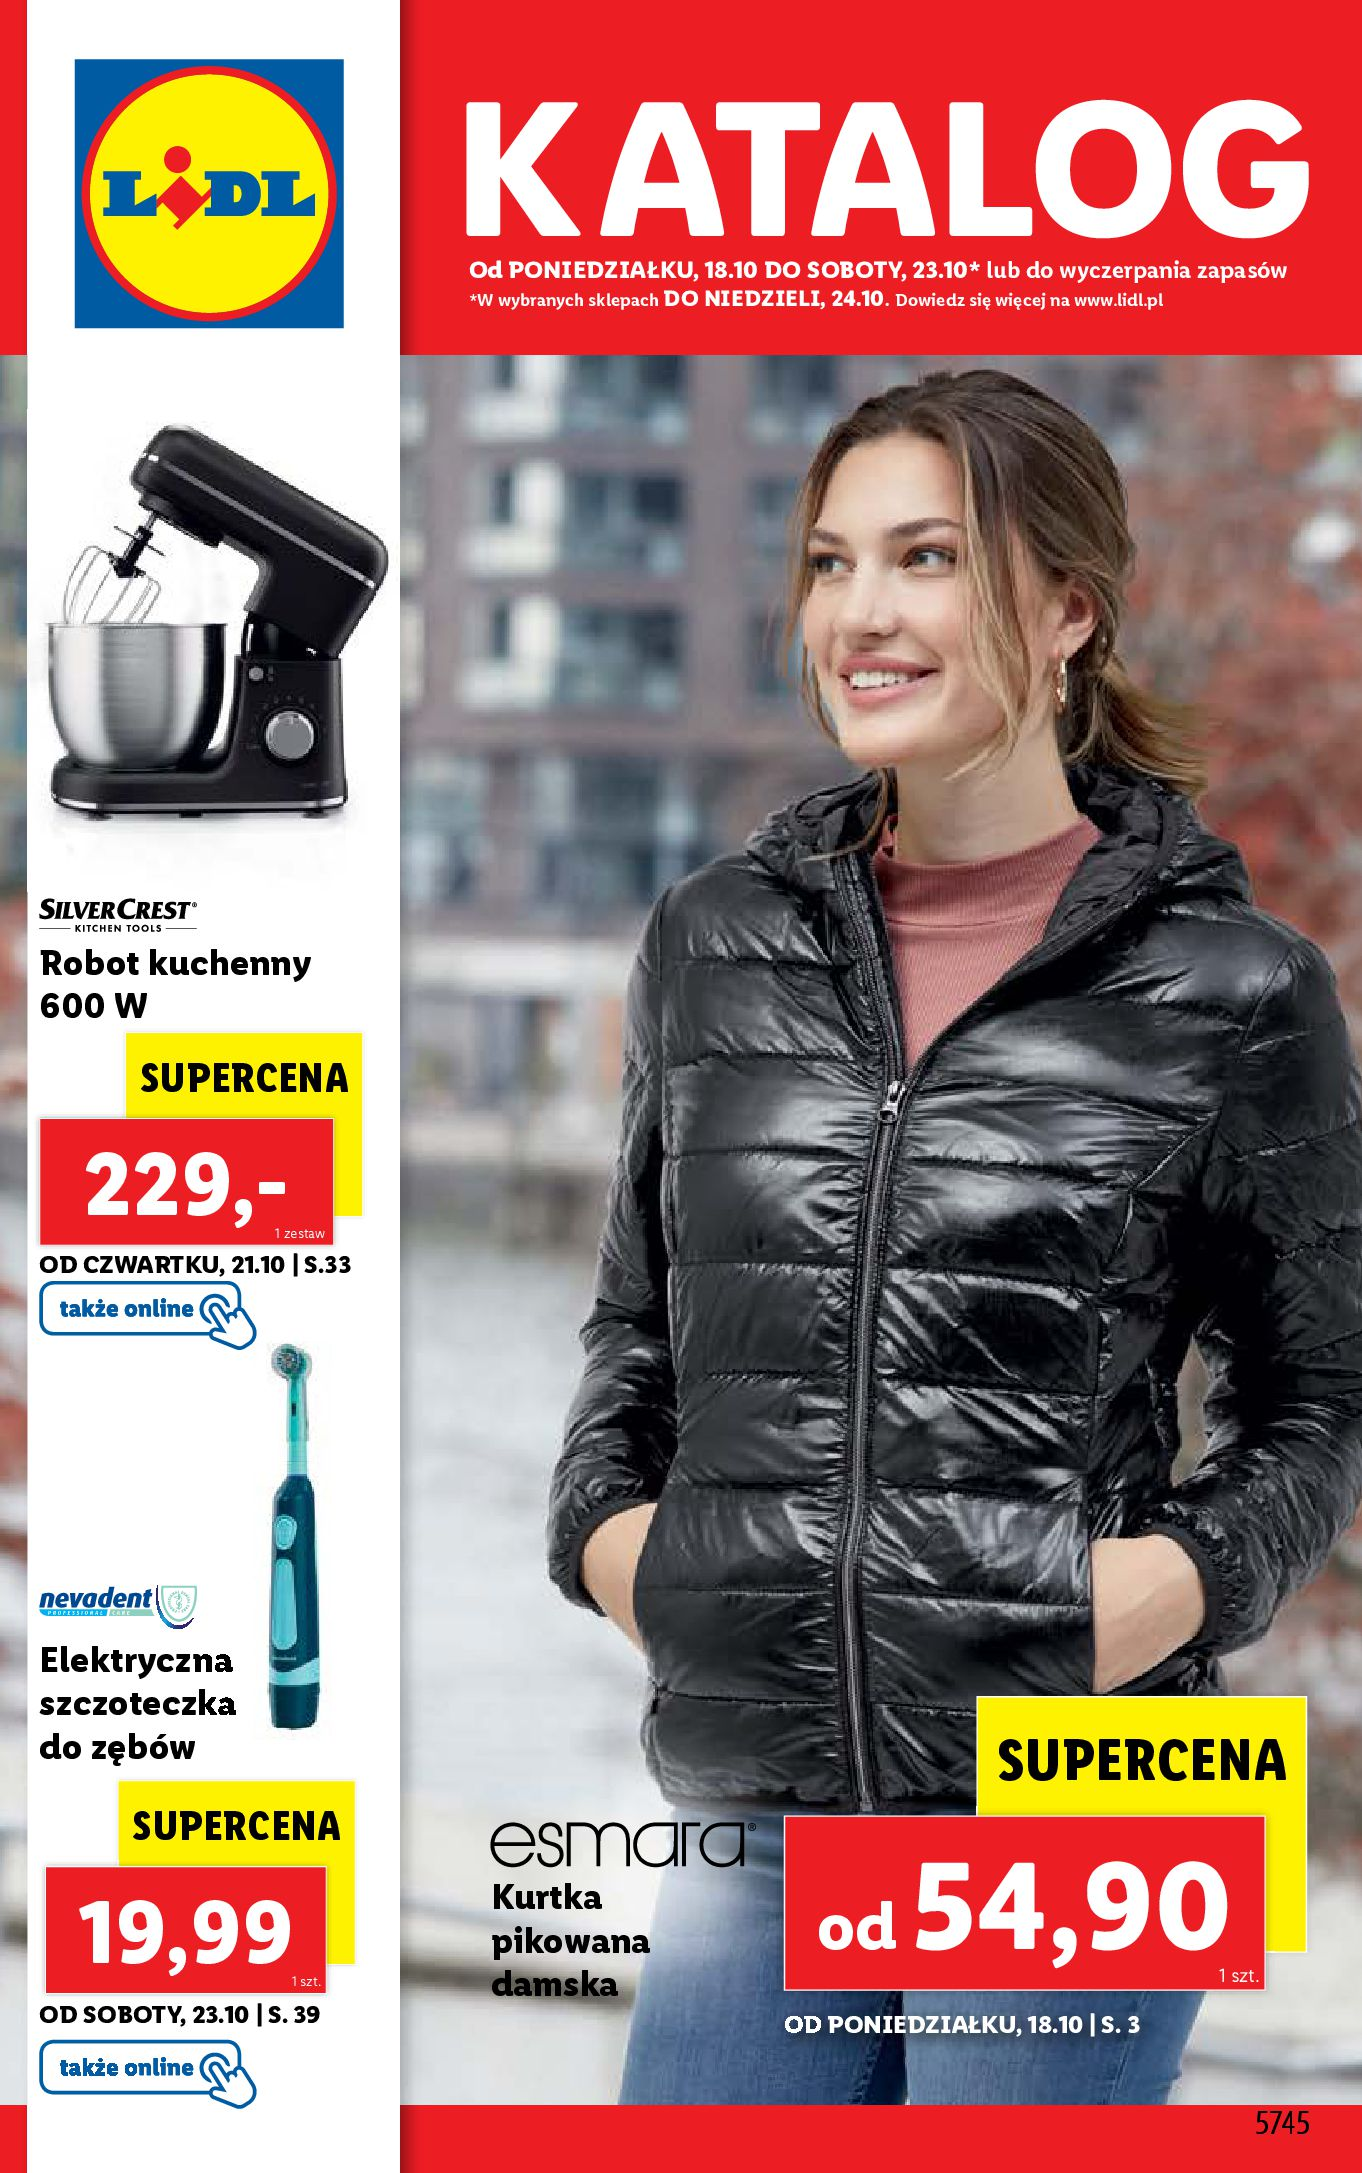 Gazetka Lidl: Gazetka Lidl - katalog 18-24.10. 2021-10-18 page-1